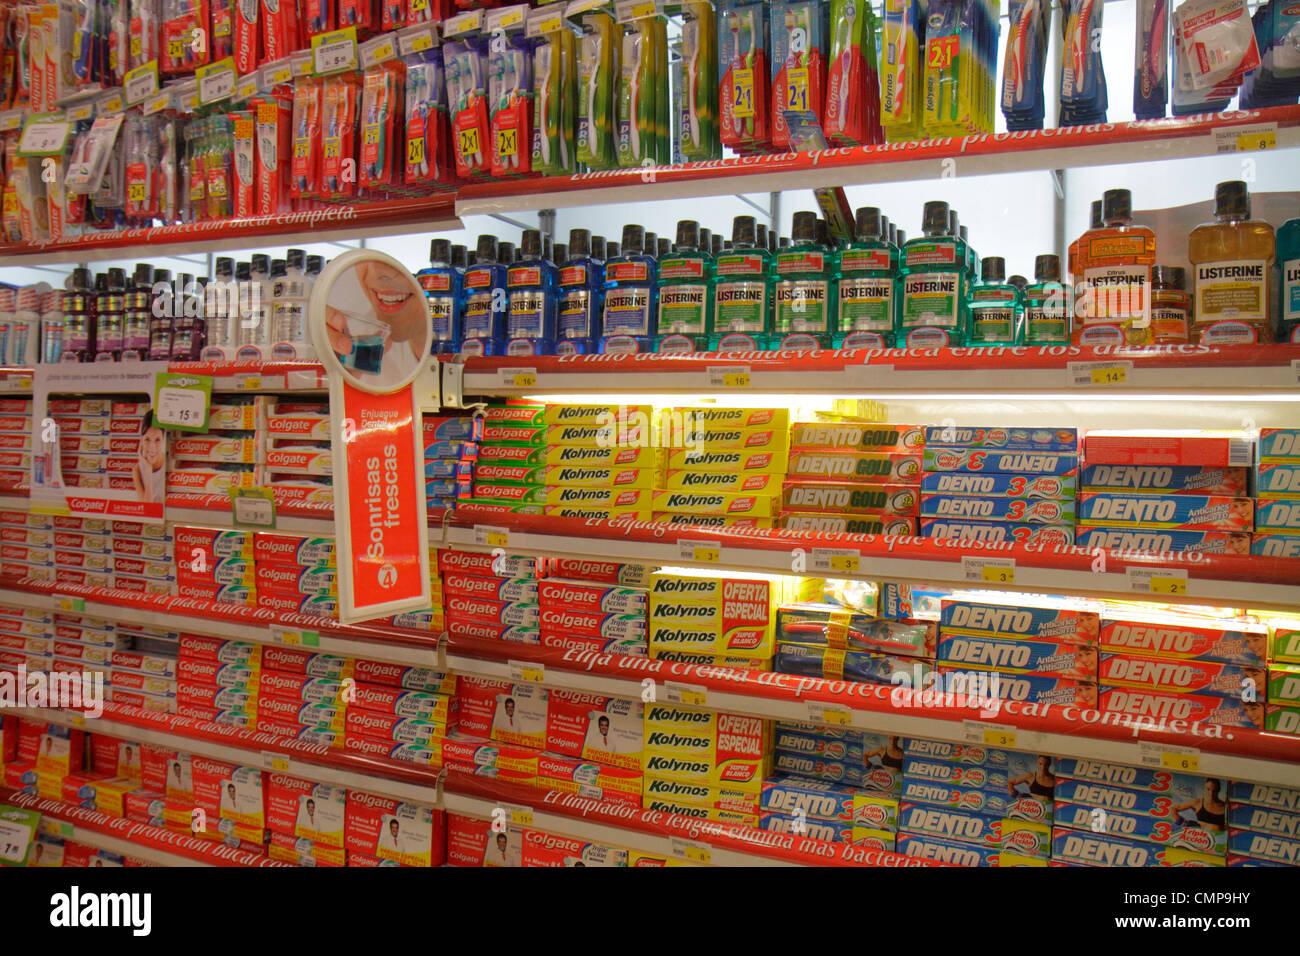 Lima Peru Santa Ana Avenida Canaval Y Moreyra Geschäft Einkaufen